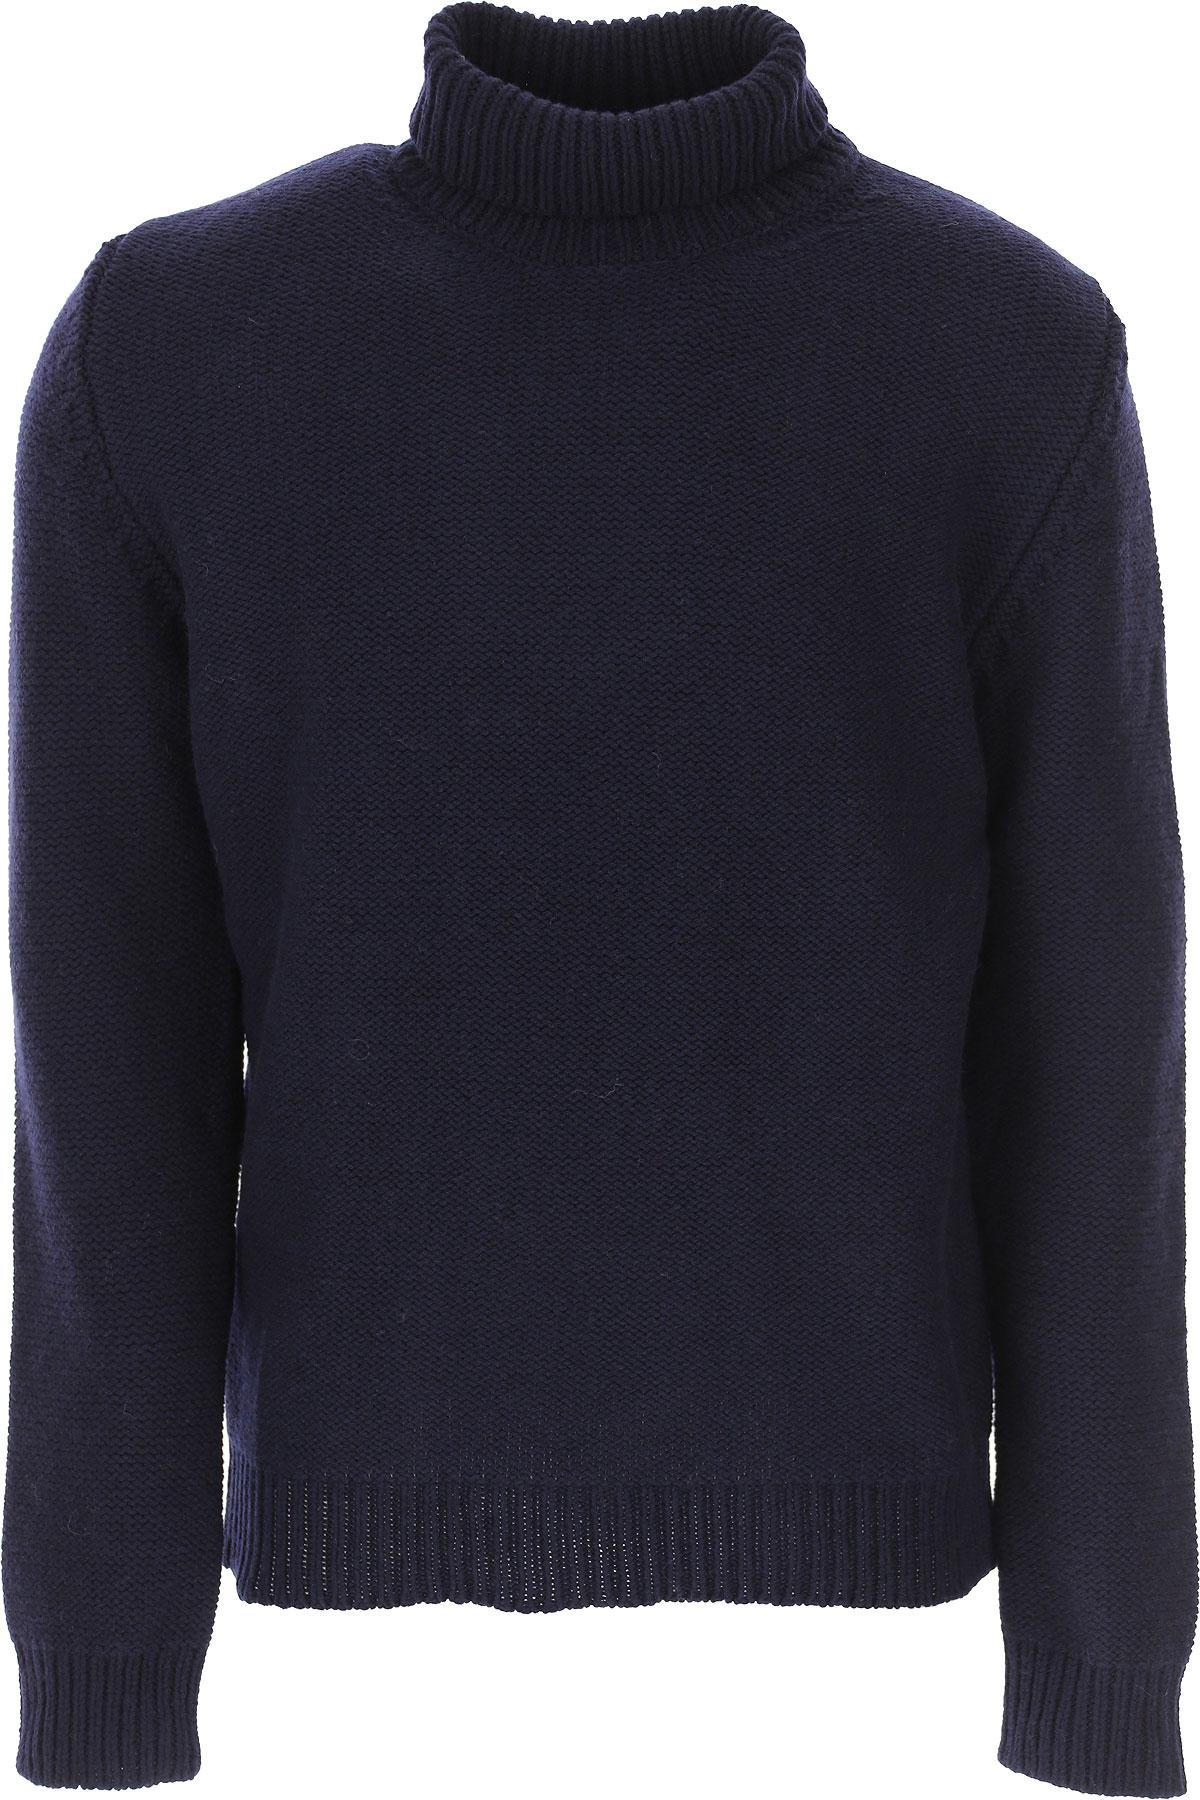 The Gigi Sweater for Men Jumper On Sale, Dark Blue, Wool, 2019, L M S